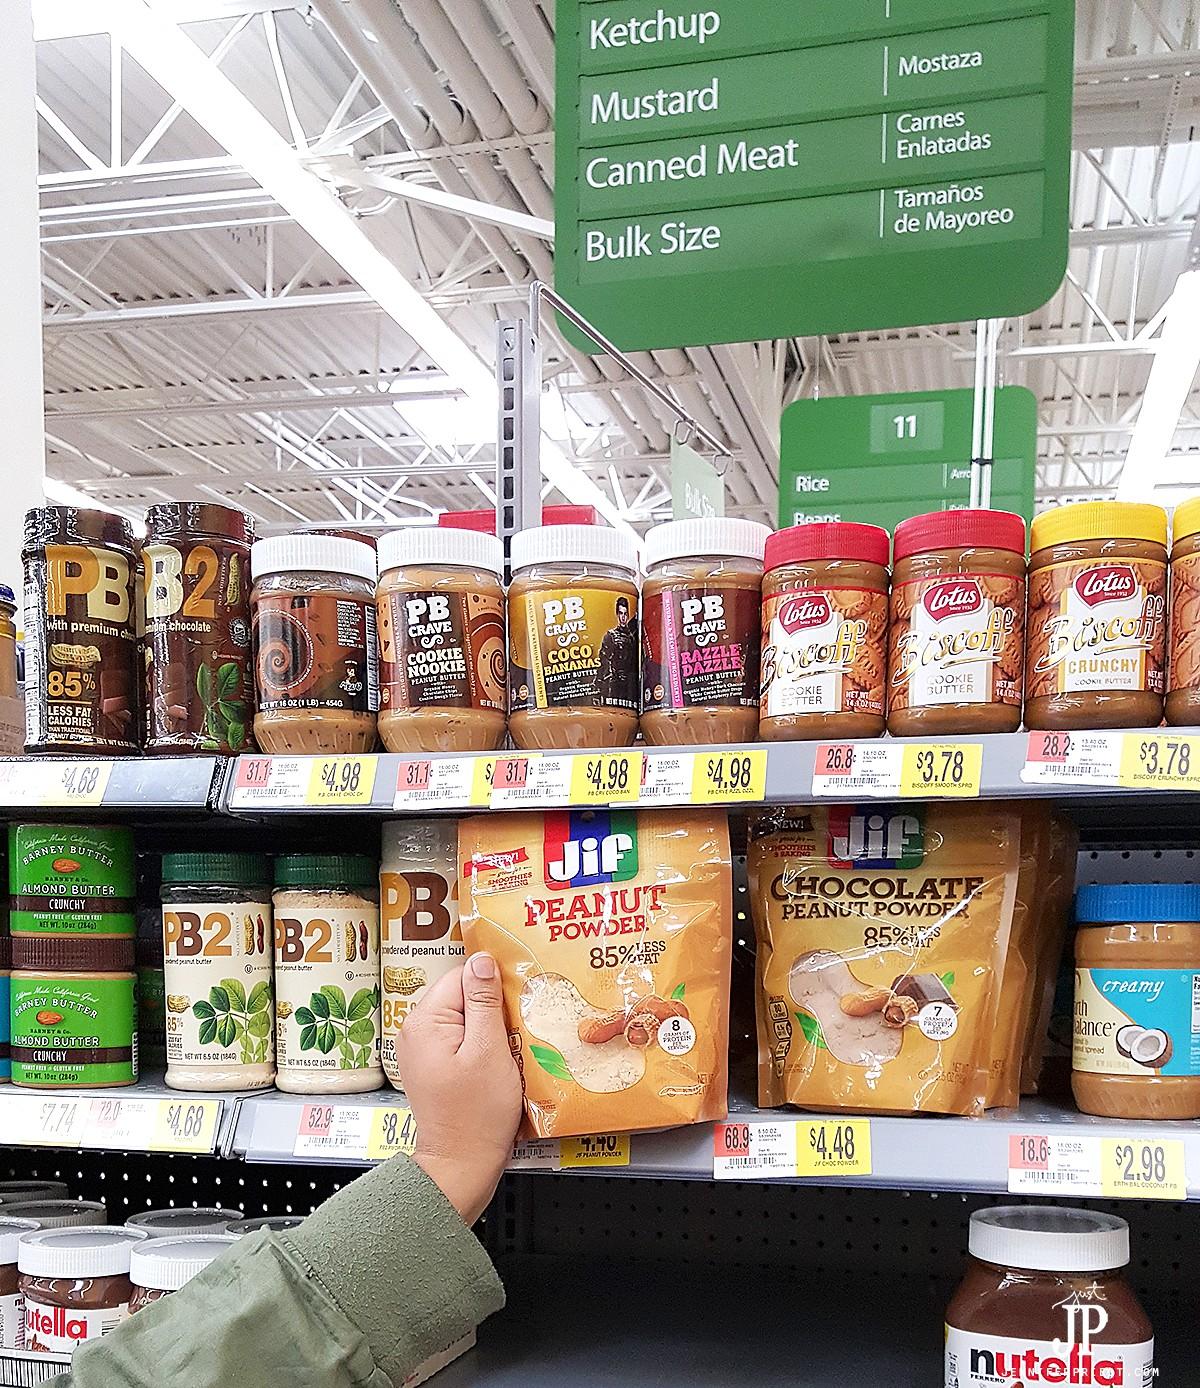 Choose-Jif-Peanut-Powder-in-the-Peanut-Butter-Aisle-JustJP